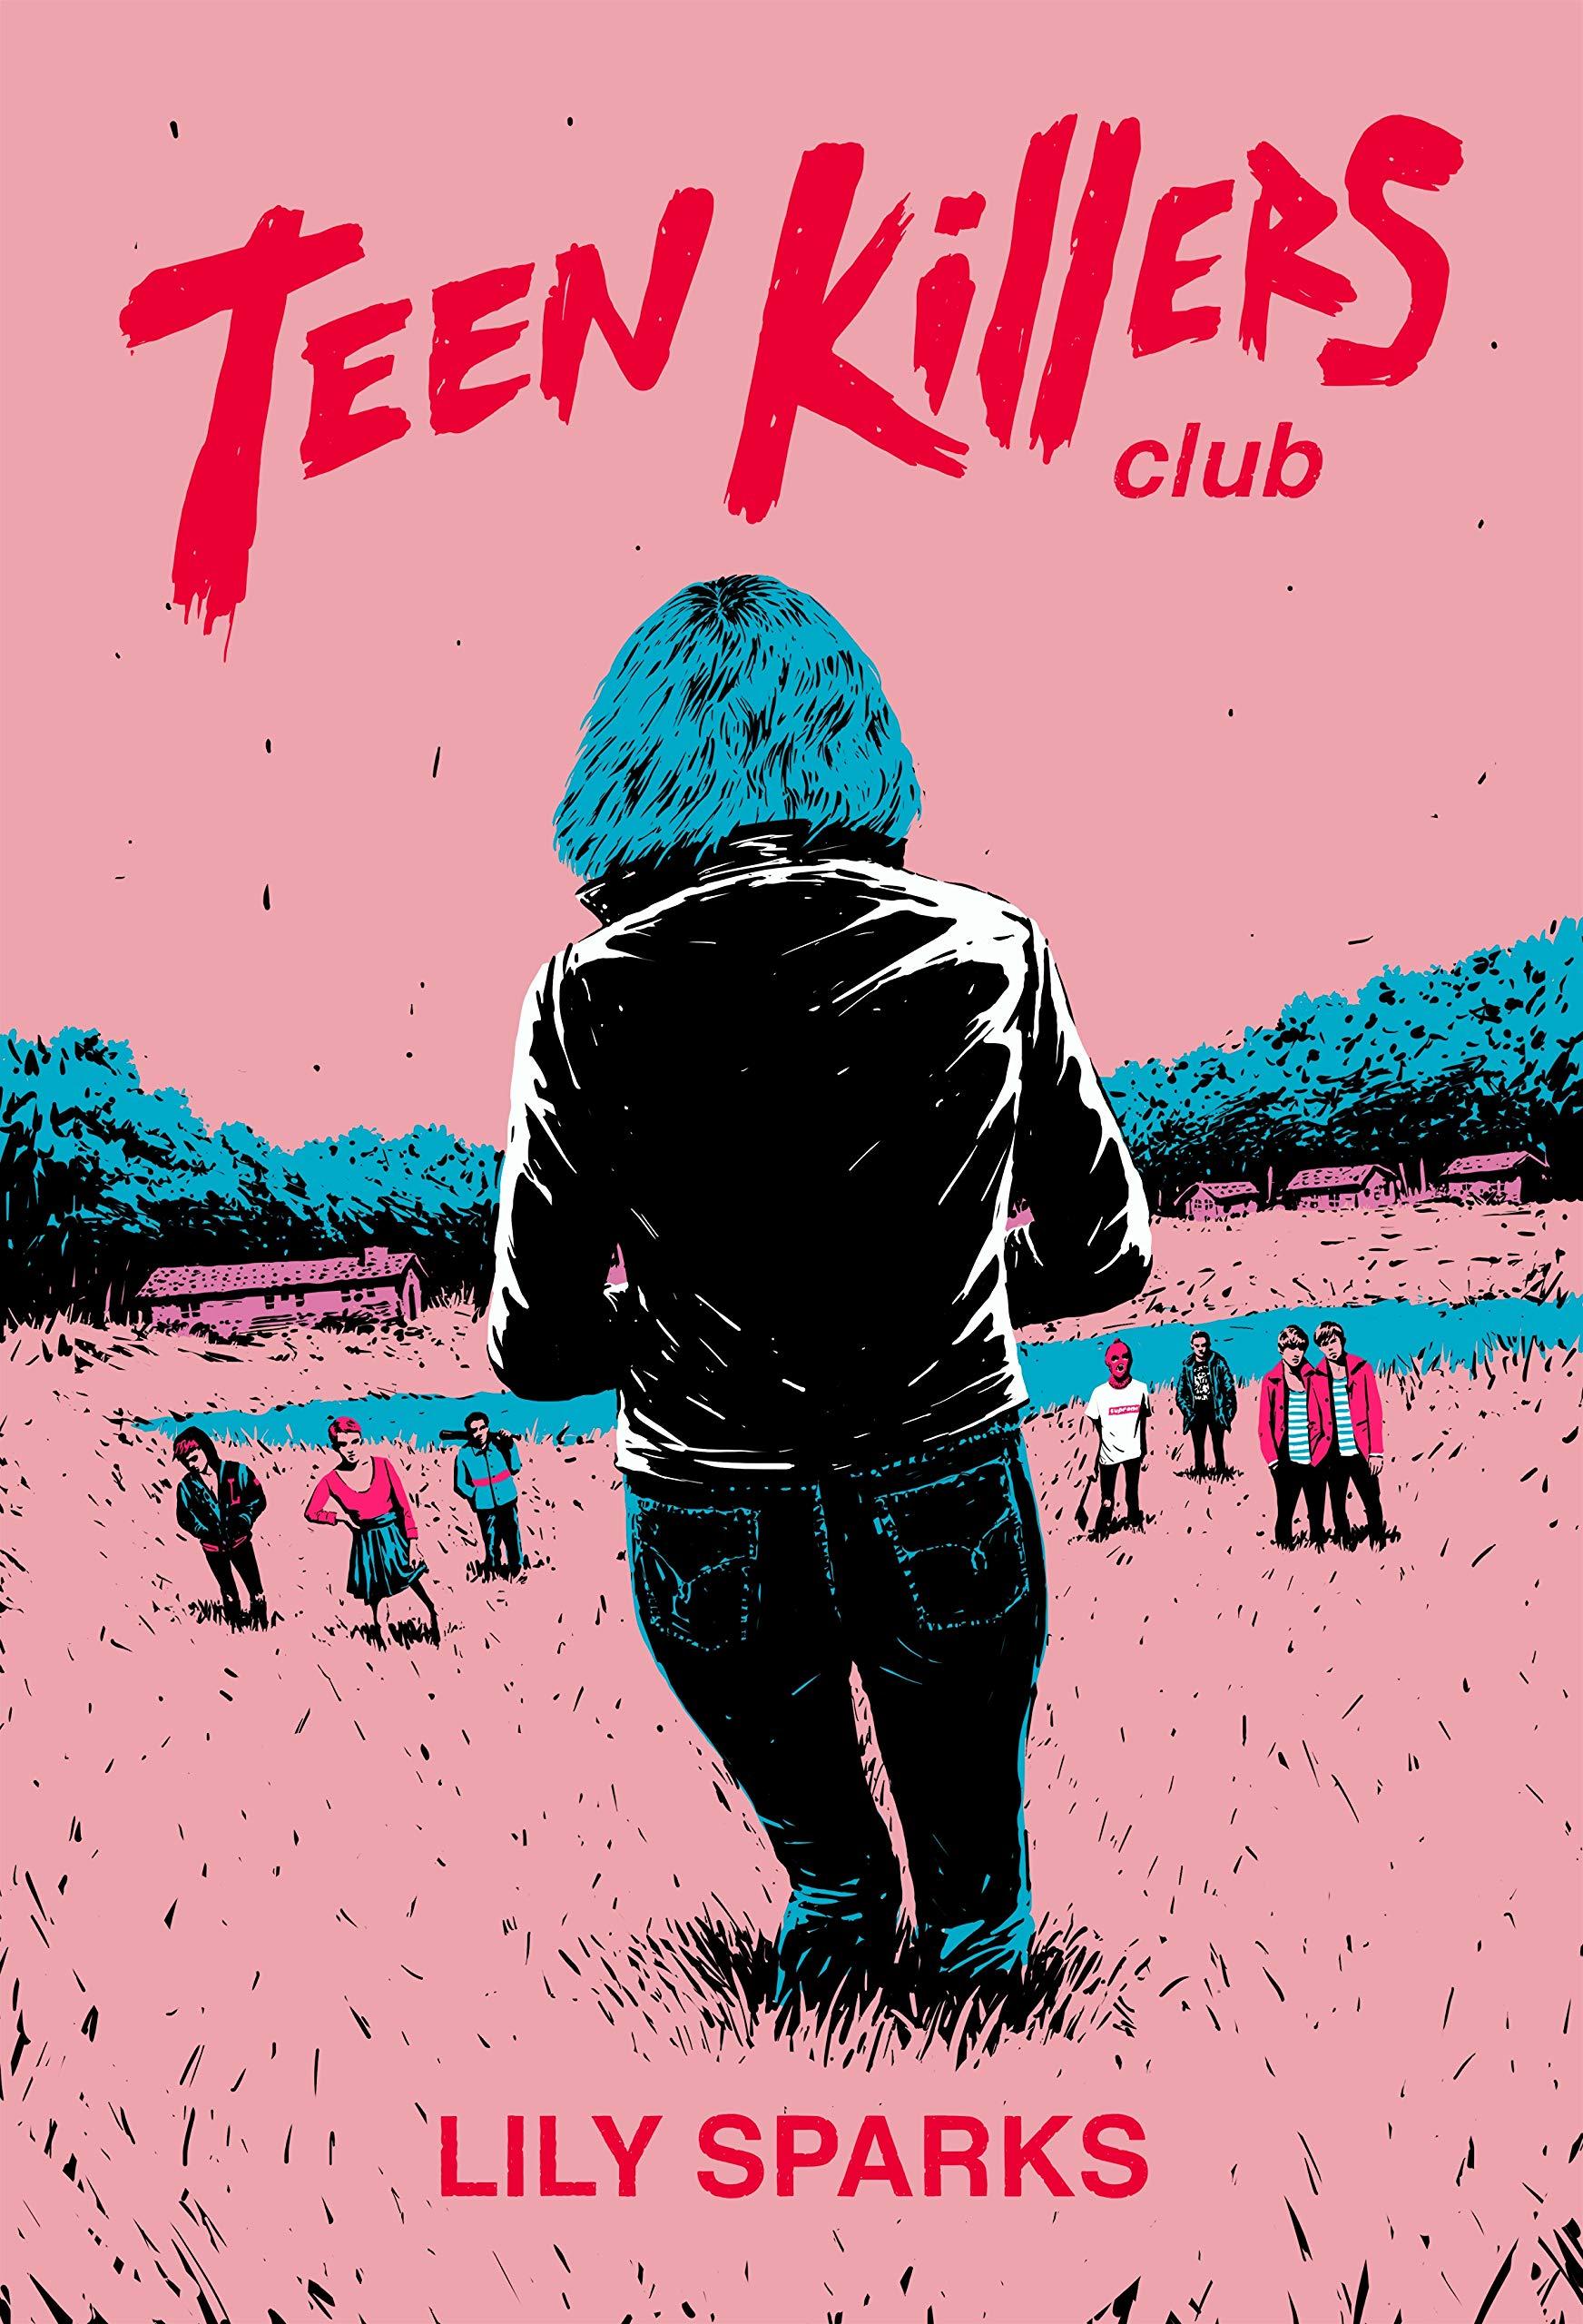 Amazon.com: Teen Killers Club: A Novel (9781643852294): Sparks, Lily: Books